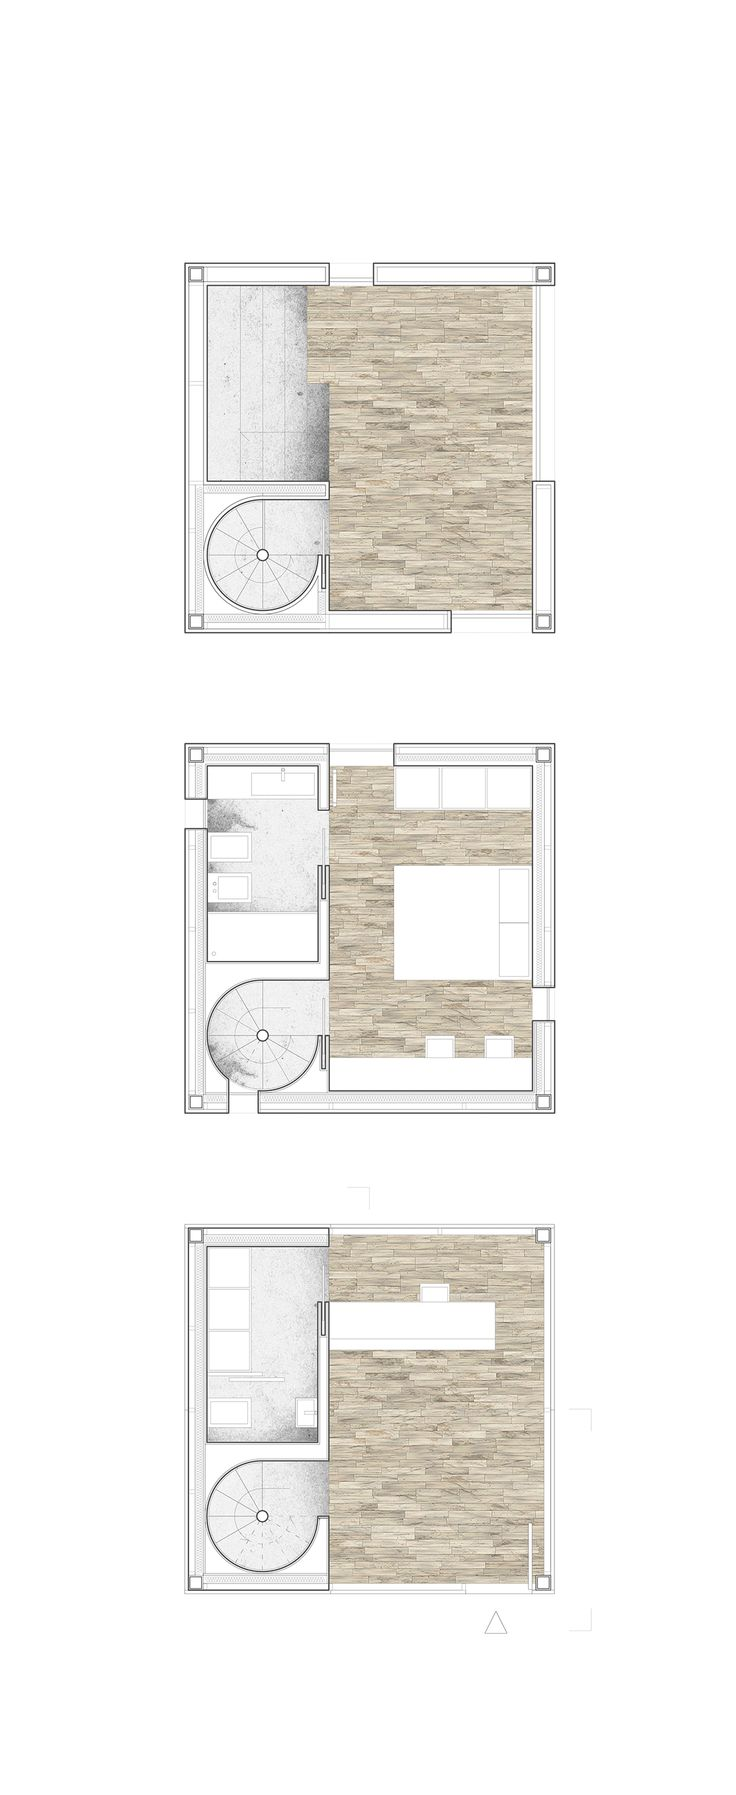 01_plans | Luglio 2014 | Architectural Competition for students and young architects. Archistart. LHT LeveranoHorizonTower. Riflessi di paesaggio project francesco polci giacomo razzolini antonio salvi